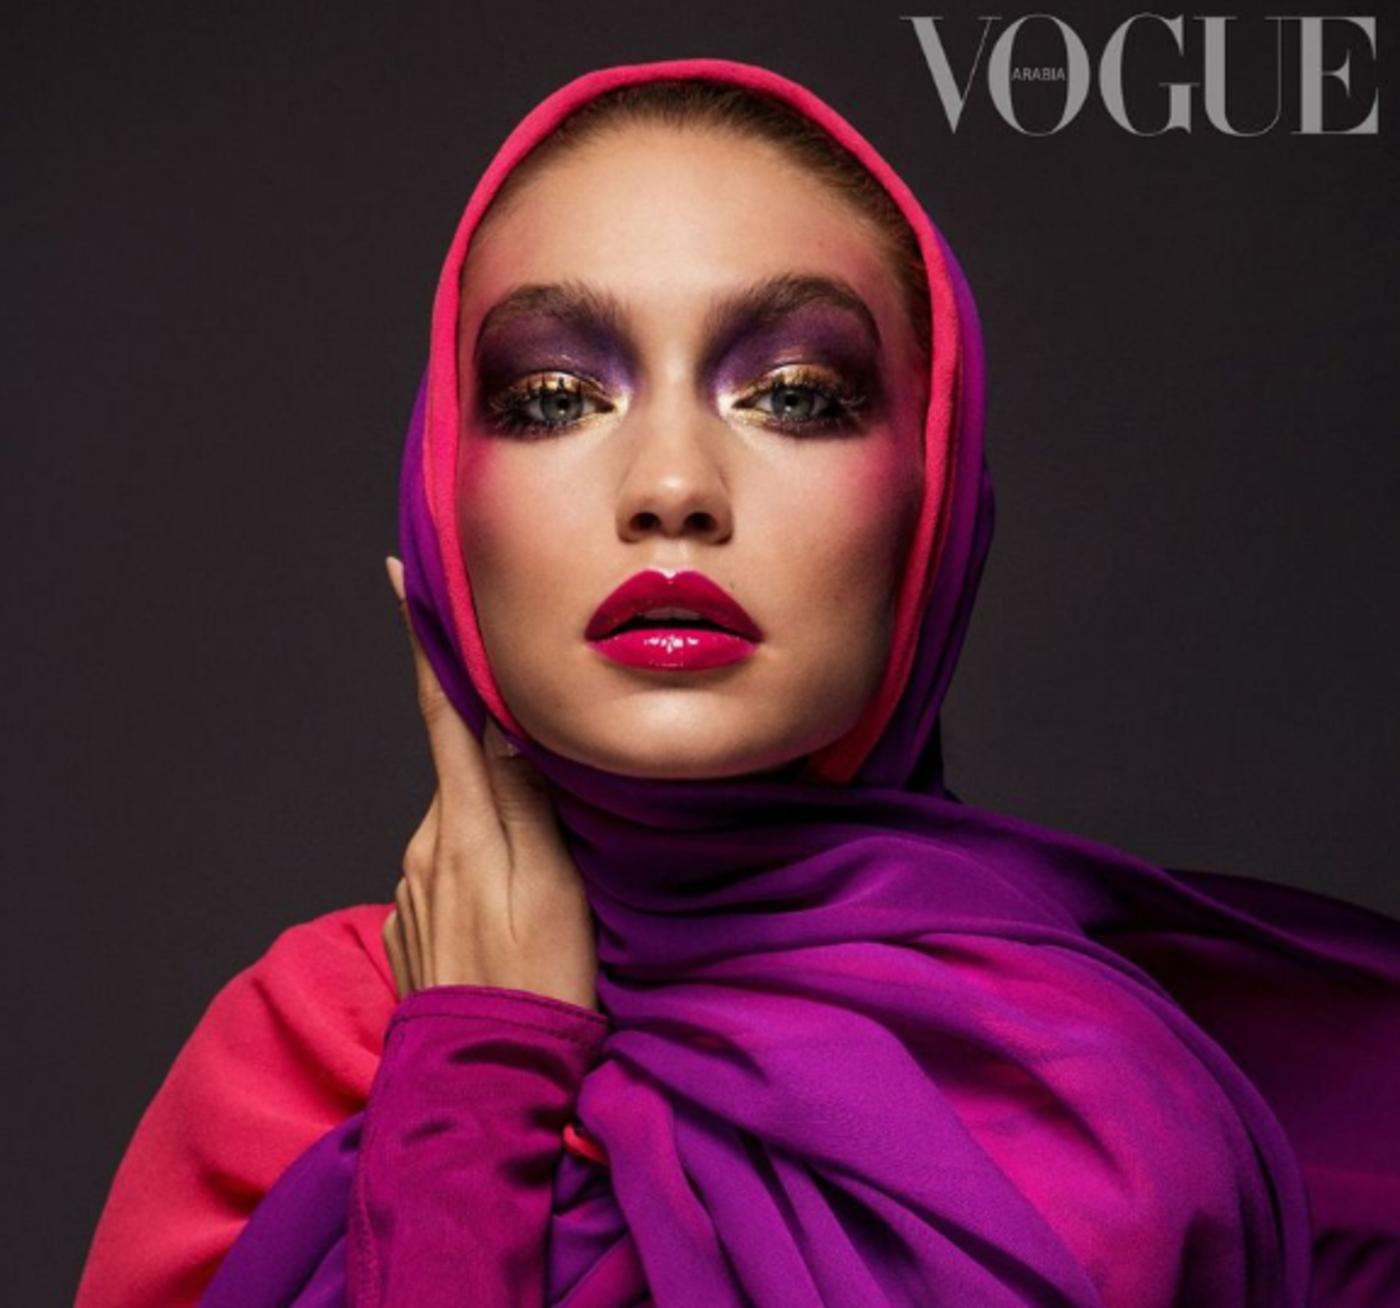 Vogue Arabia - May 2018 - Free eBooks Download